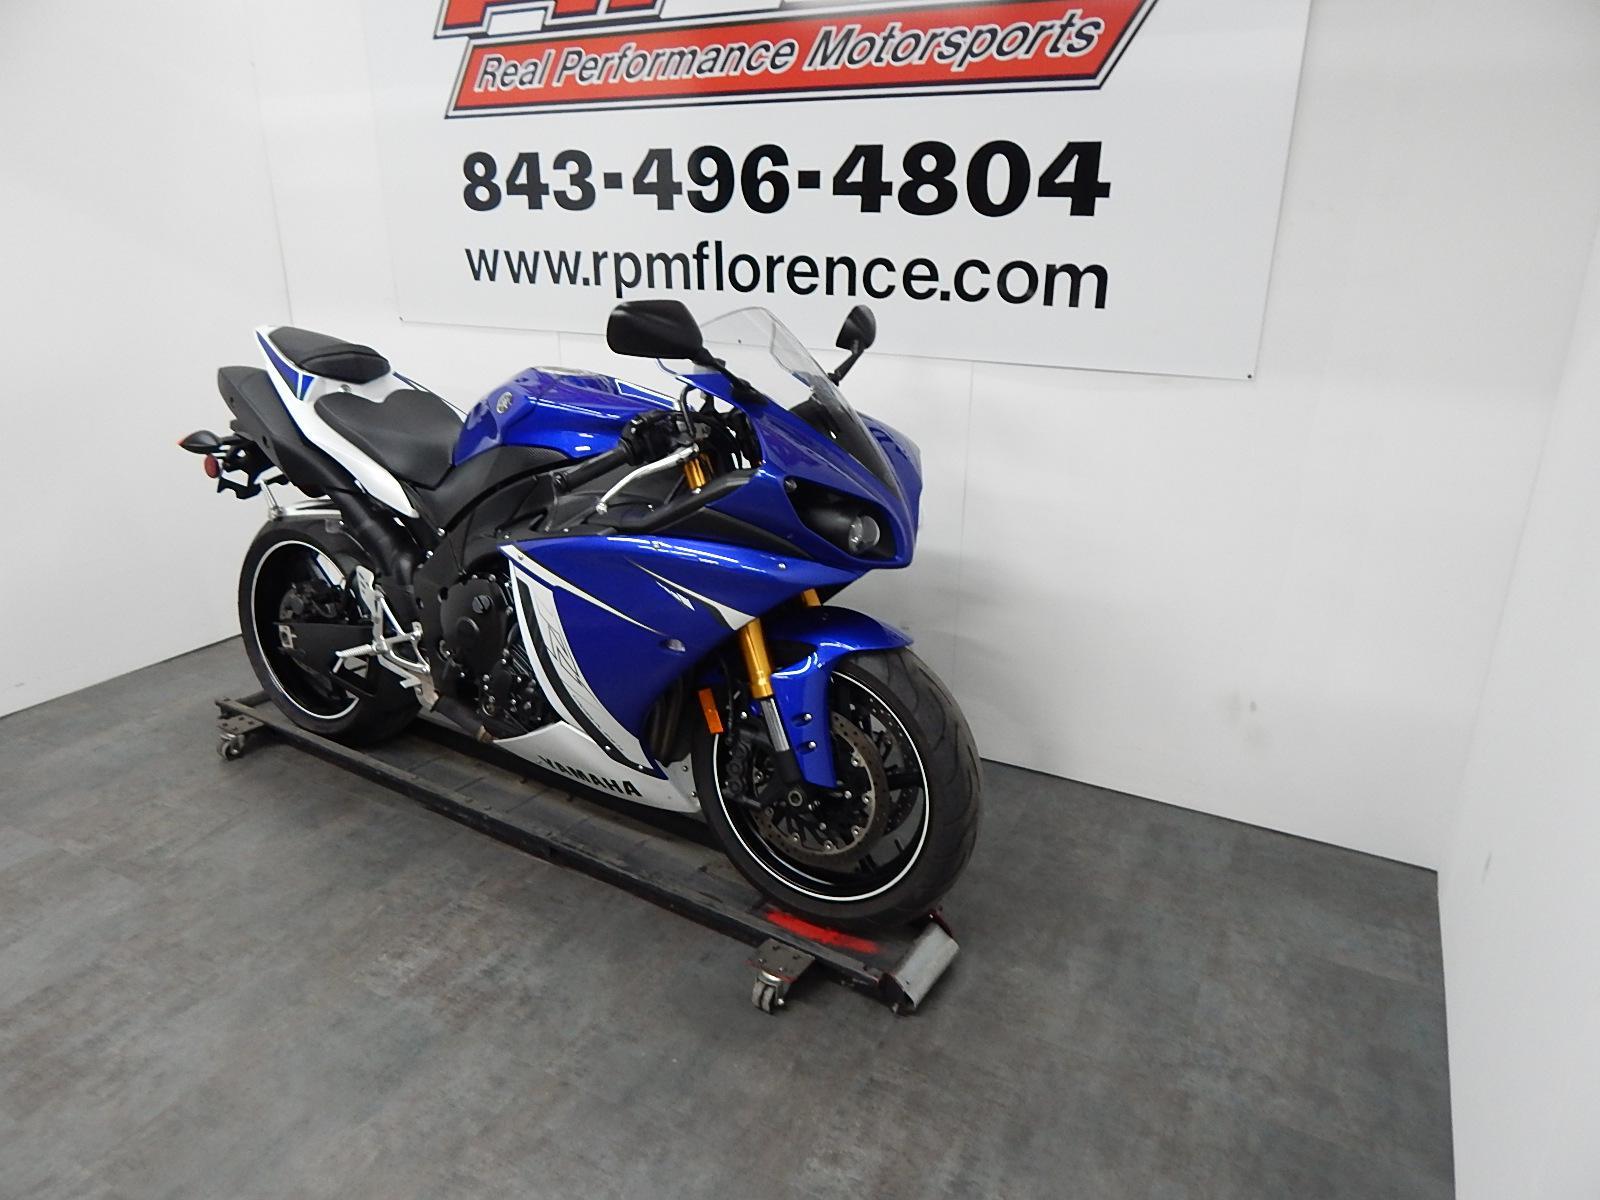 2011 Yamaha YZF-R1 - Team Yamaha Blue/White for sale in